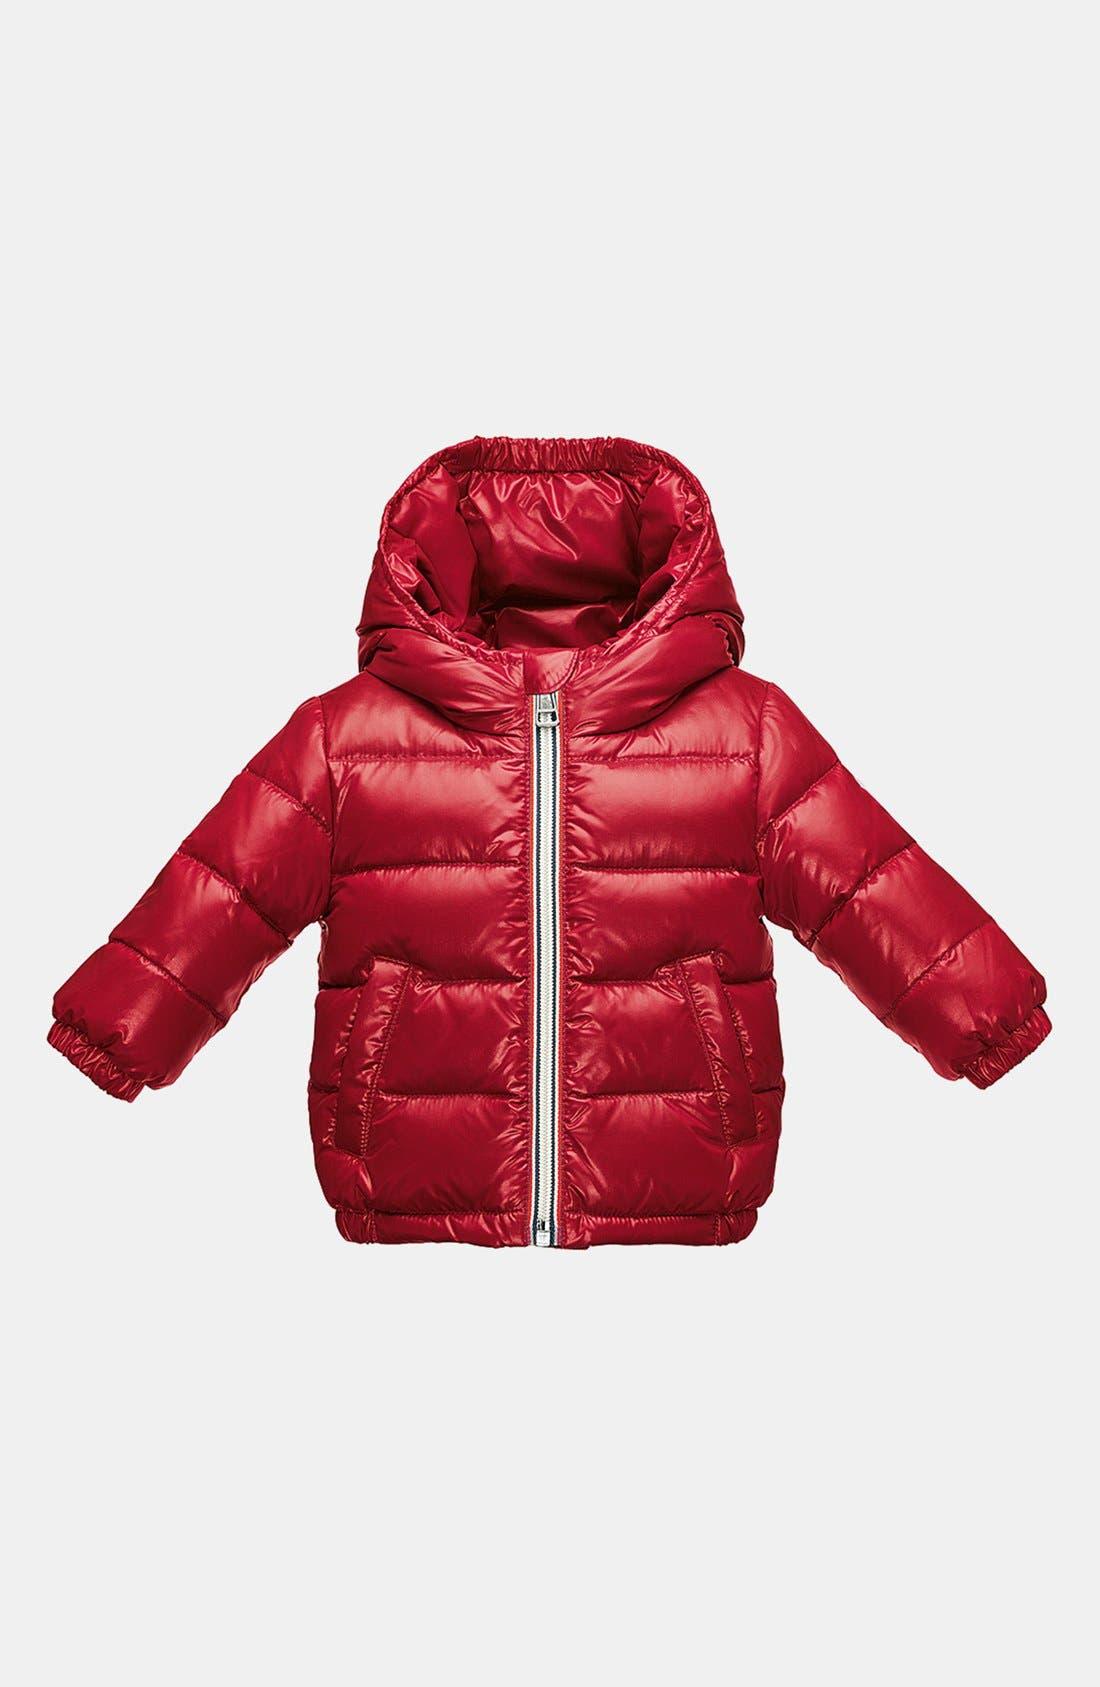 Alternate Image 1 Selected - Moncler 'Aubert' Jacket (Baby Boys)